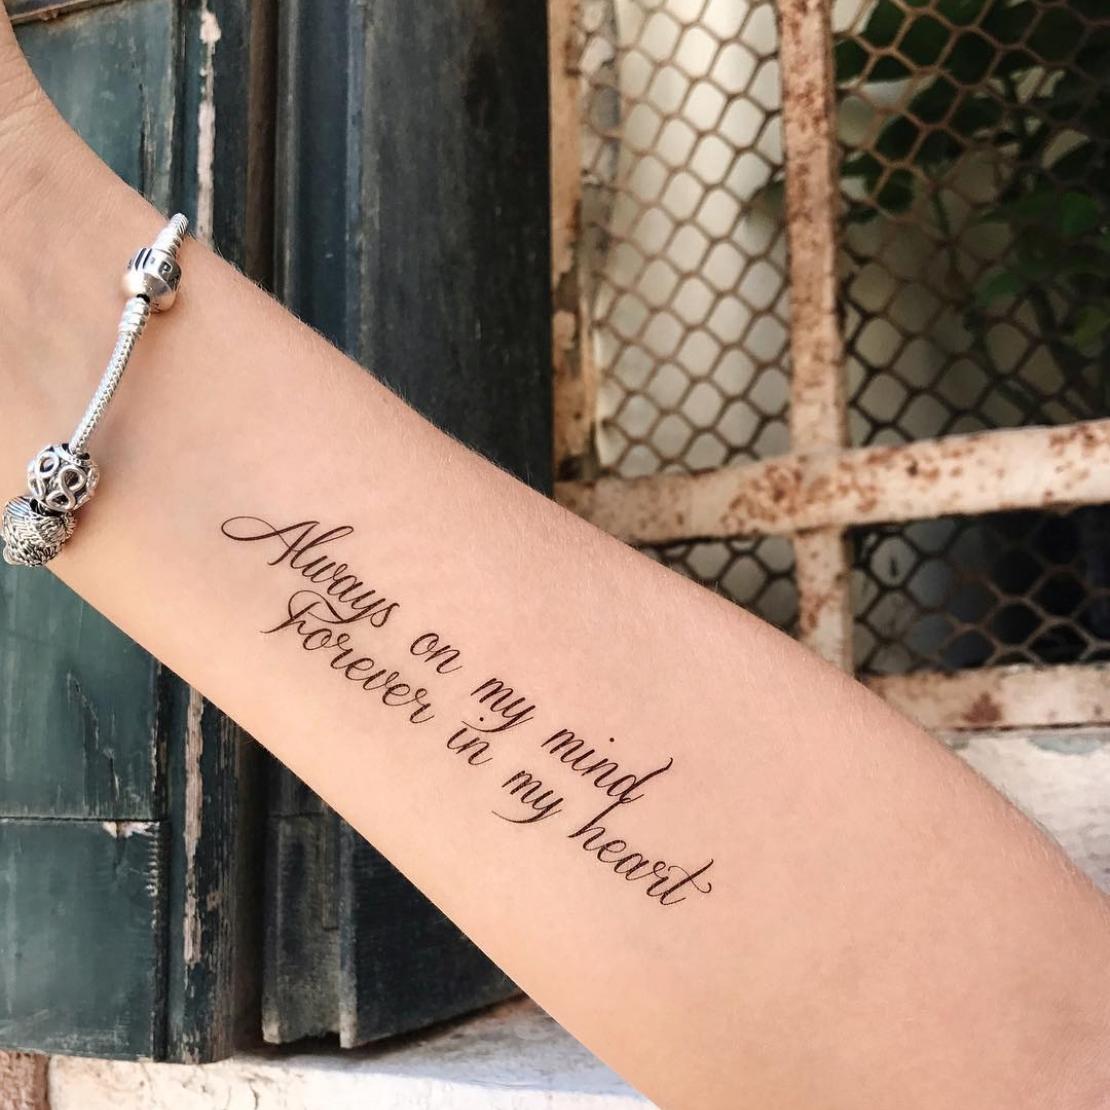 Tattoo vide cui fidas Zobacz